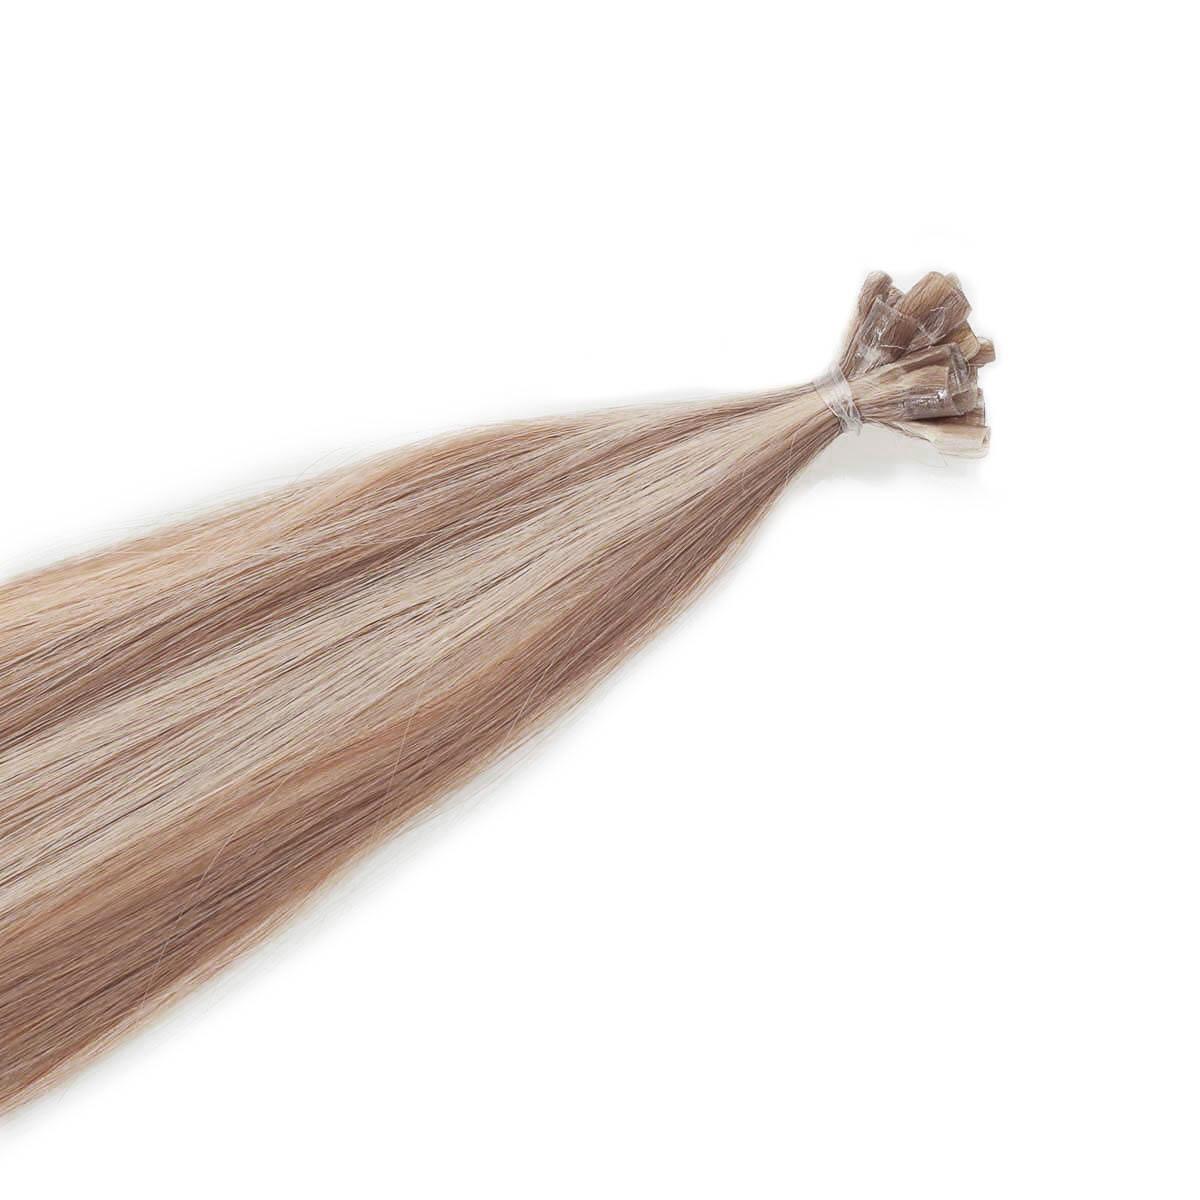 Nail Hair Original M7.3/10.8 Cendre Ash Blonde Mix 50 cm